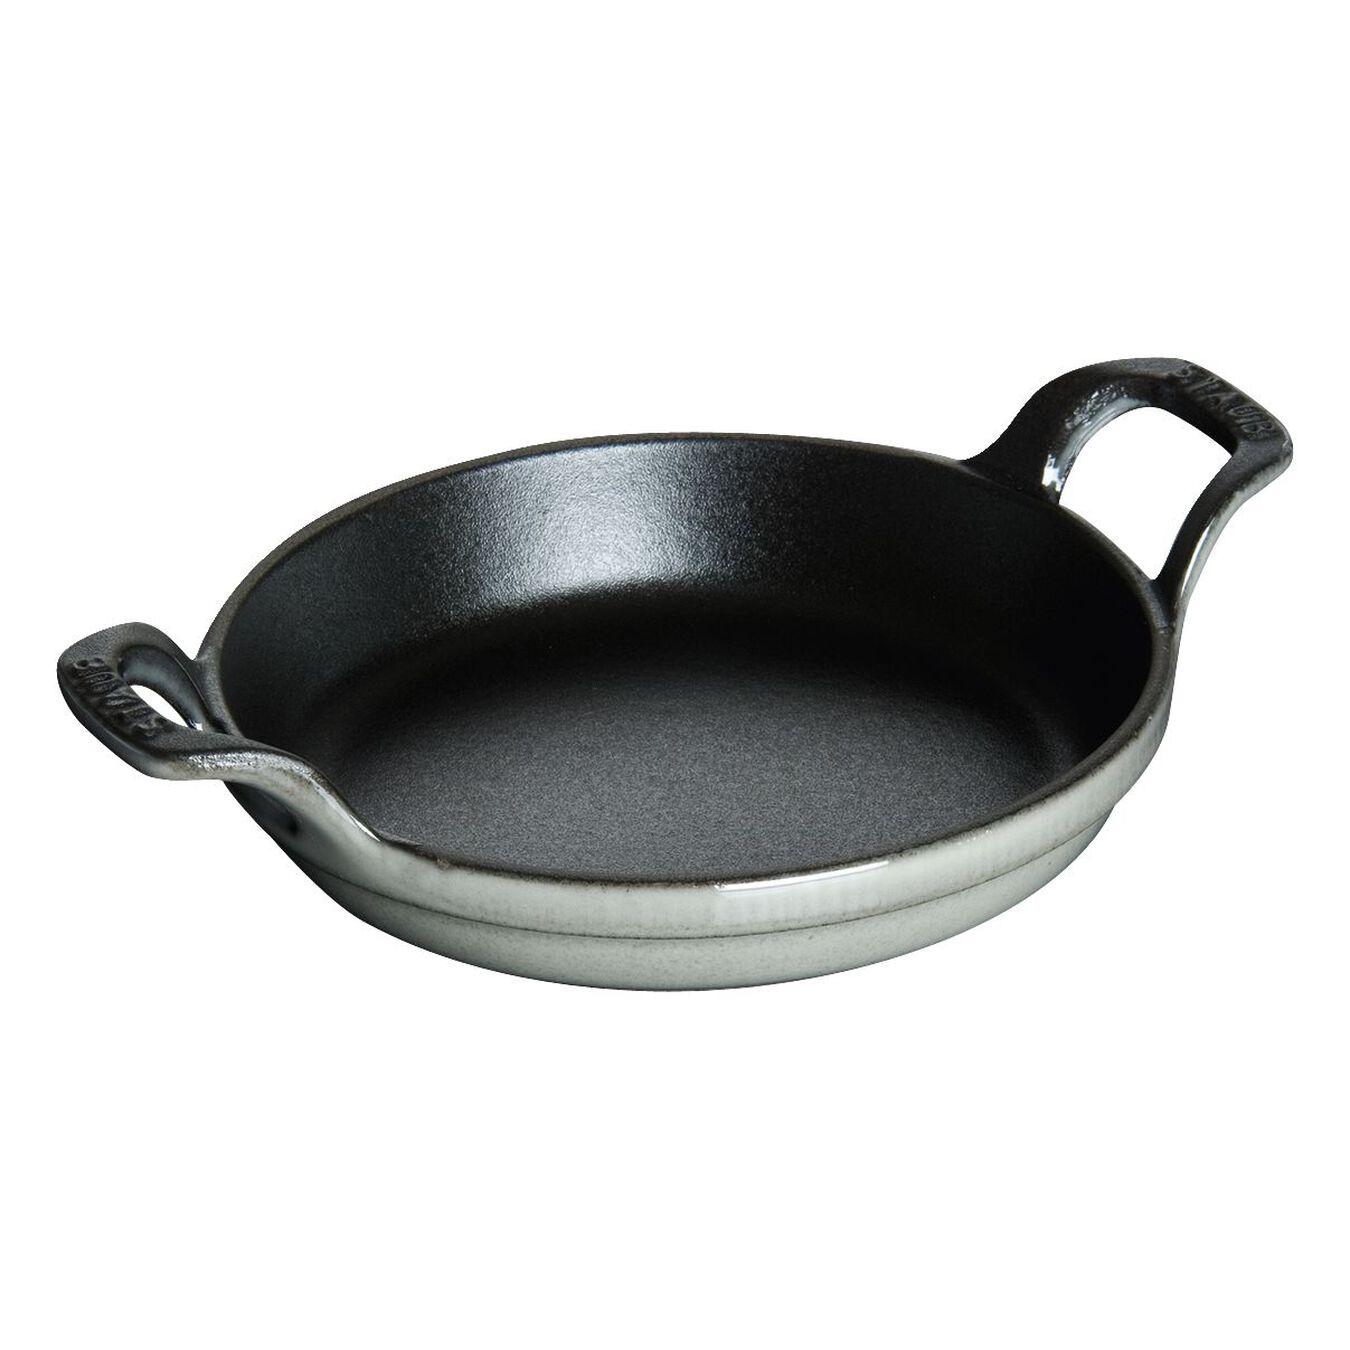 4.5-inch Mini Round Gratin Baking Dish - Graphite Grey,,large 1